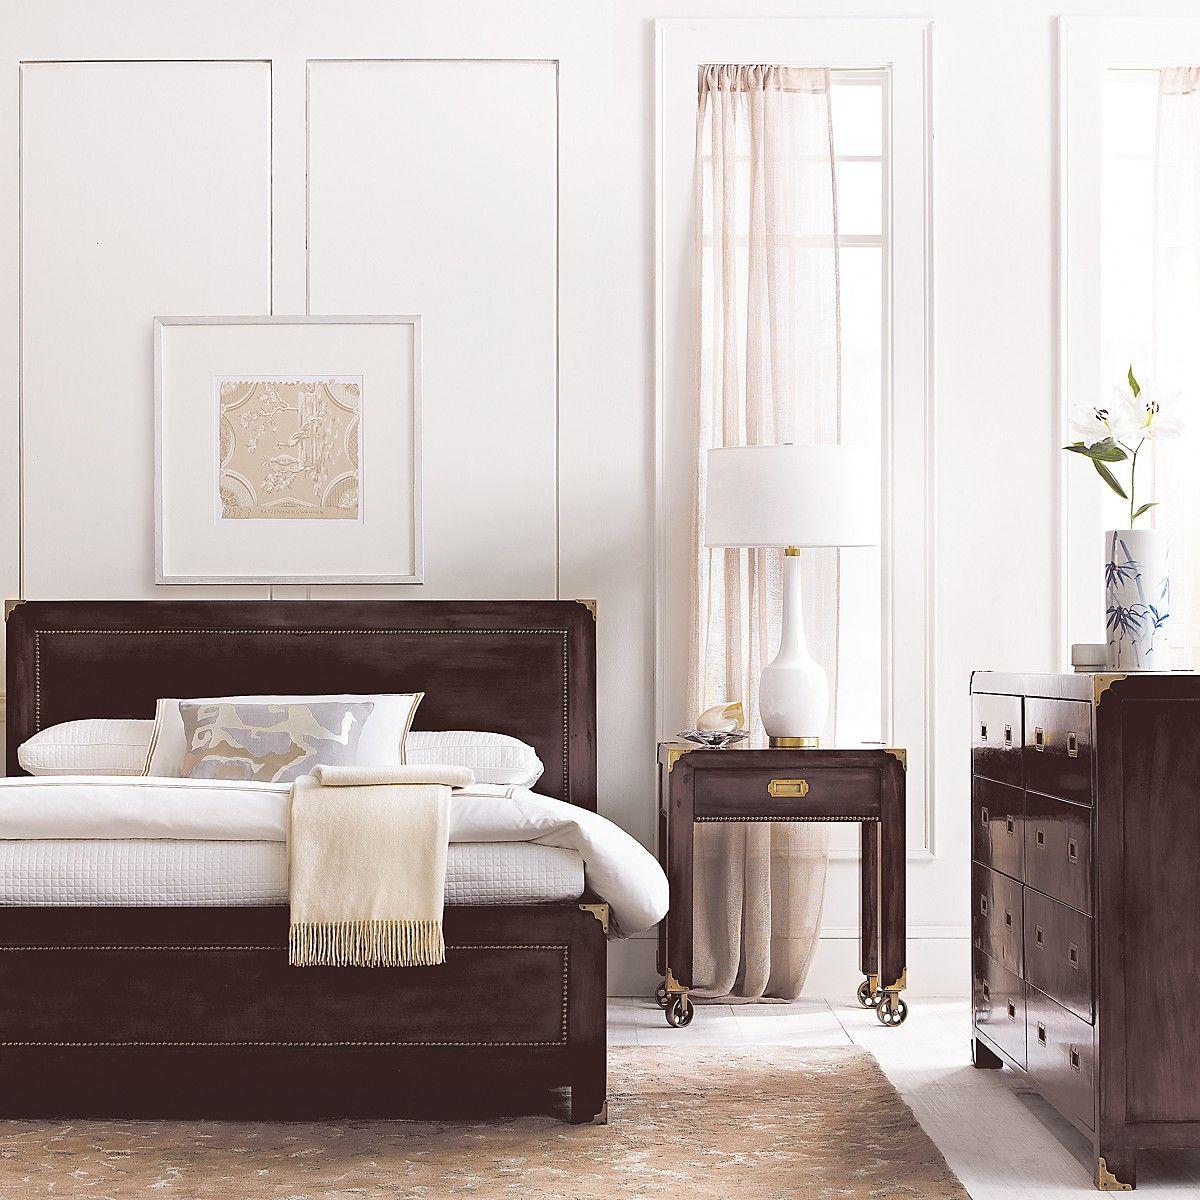 Grange Campaign Bedroom Bloomingdales Master Bedroom Pinterest Bedrooms Master Bedroom